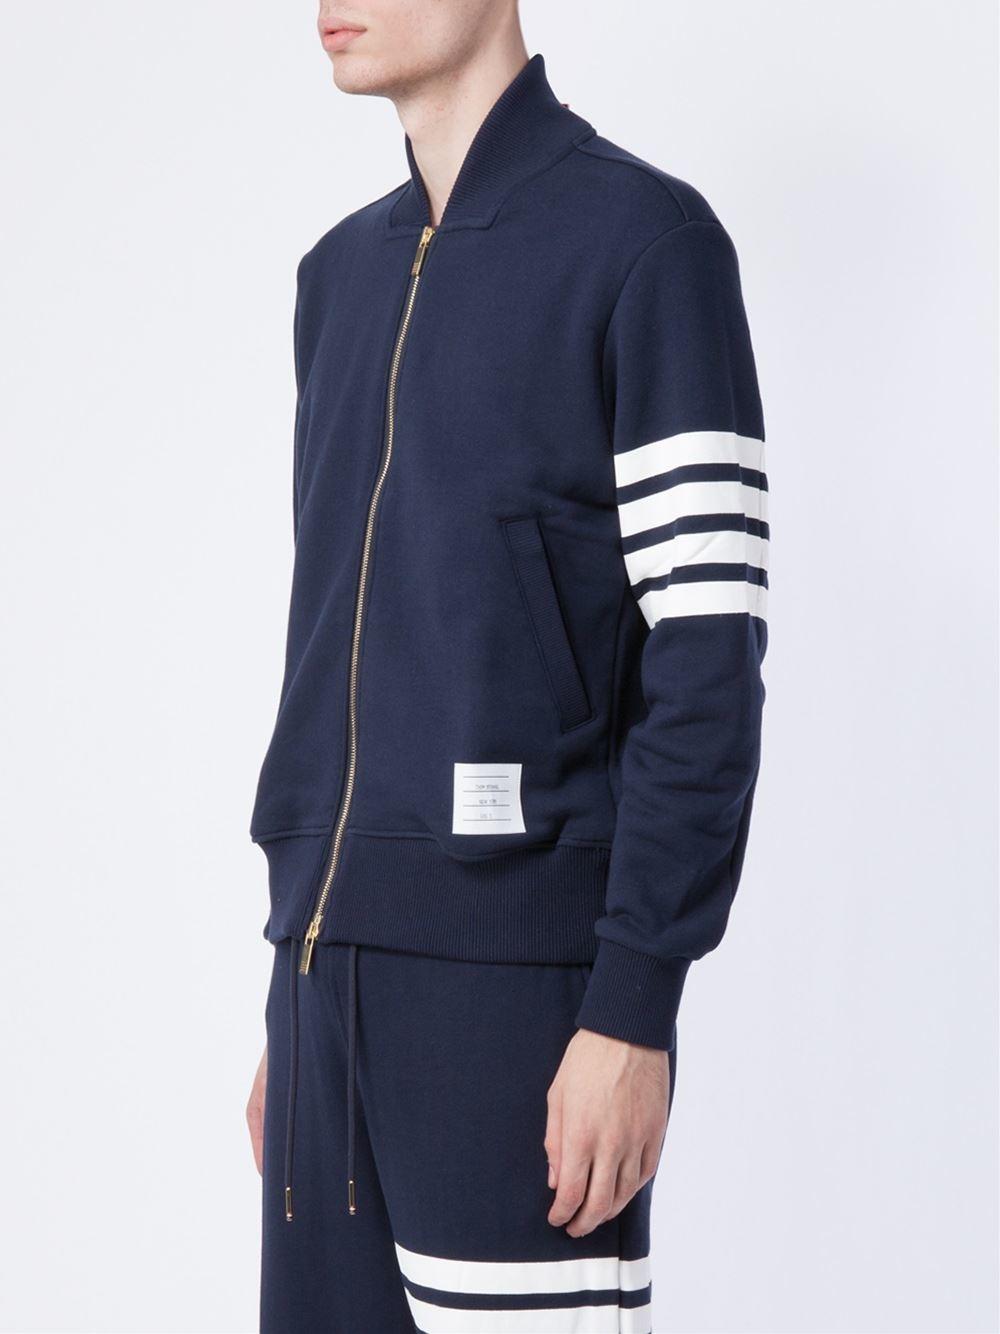 Good tom brown jacket | LRZO